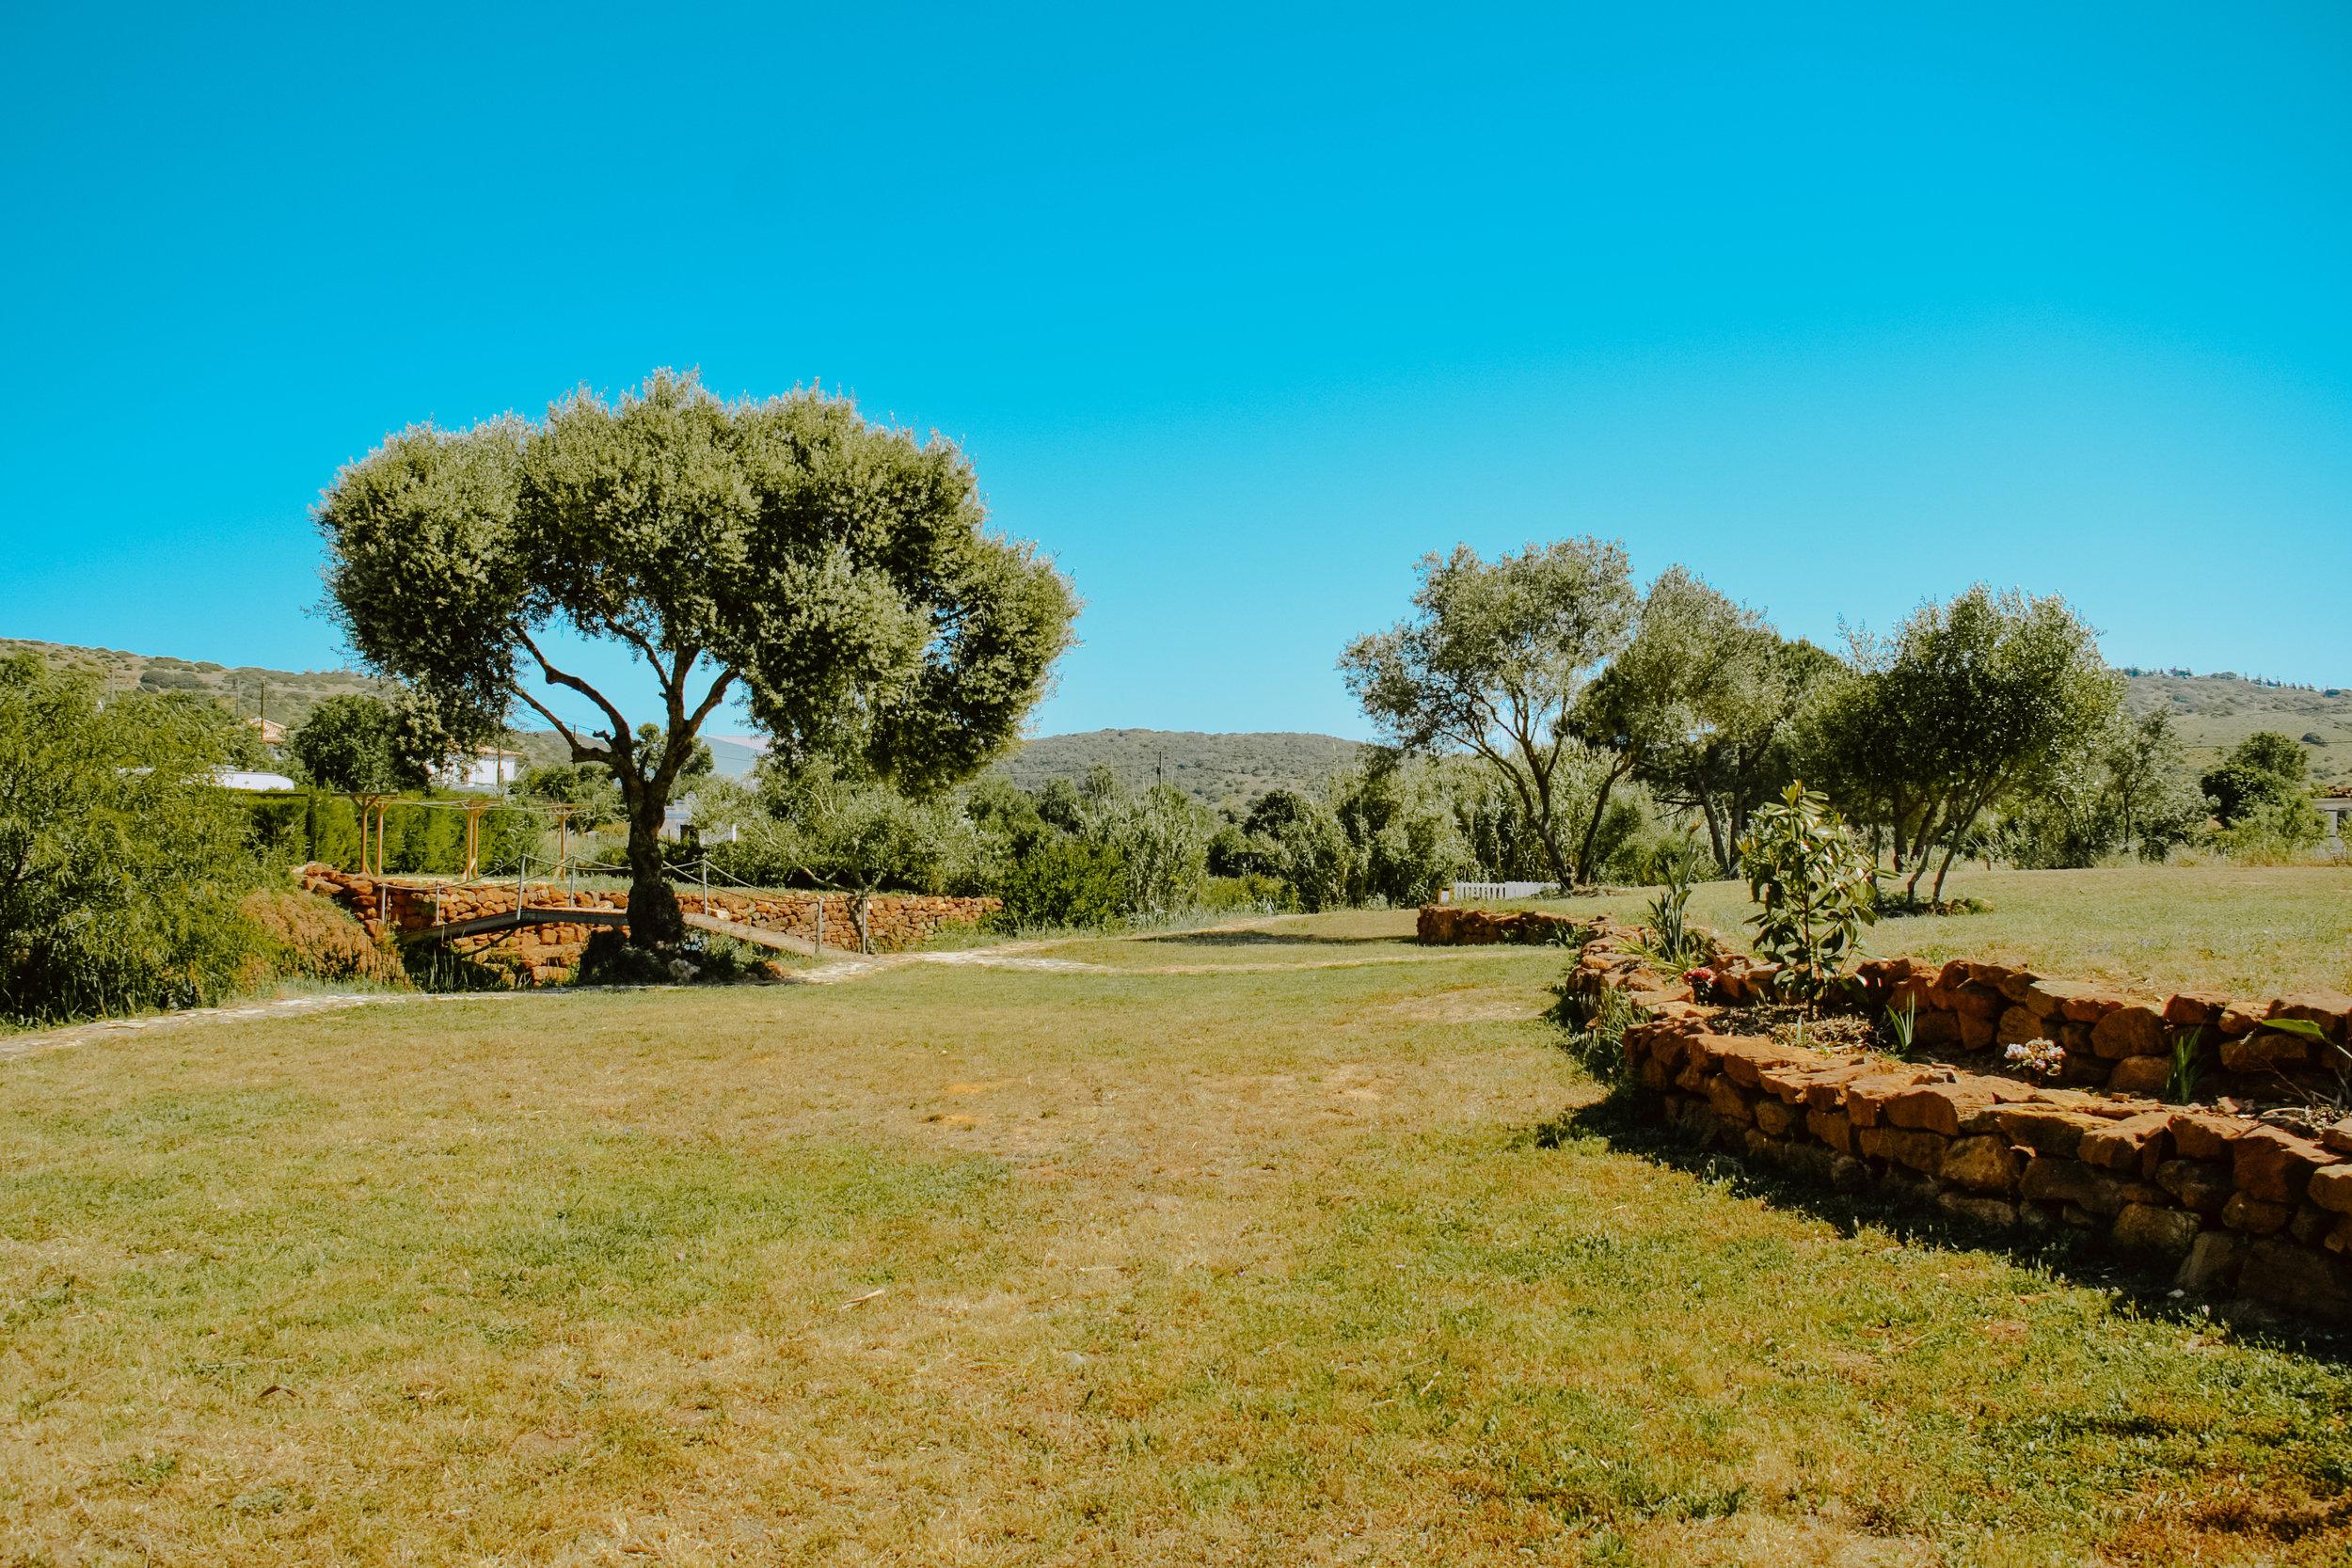 Campsite with garden